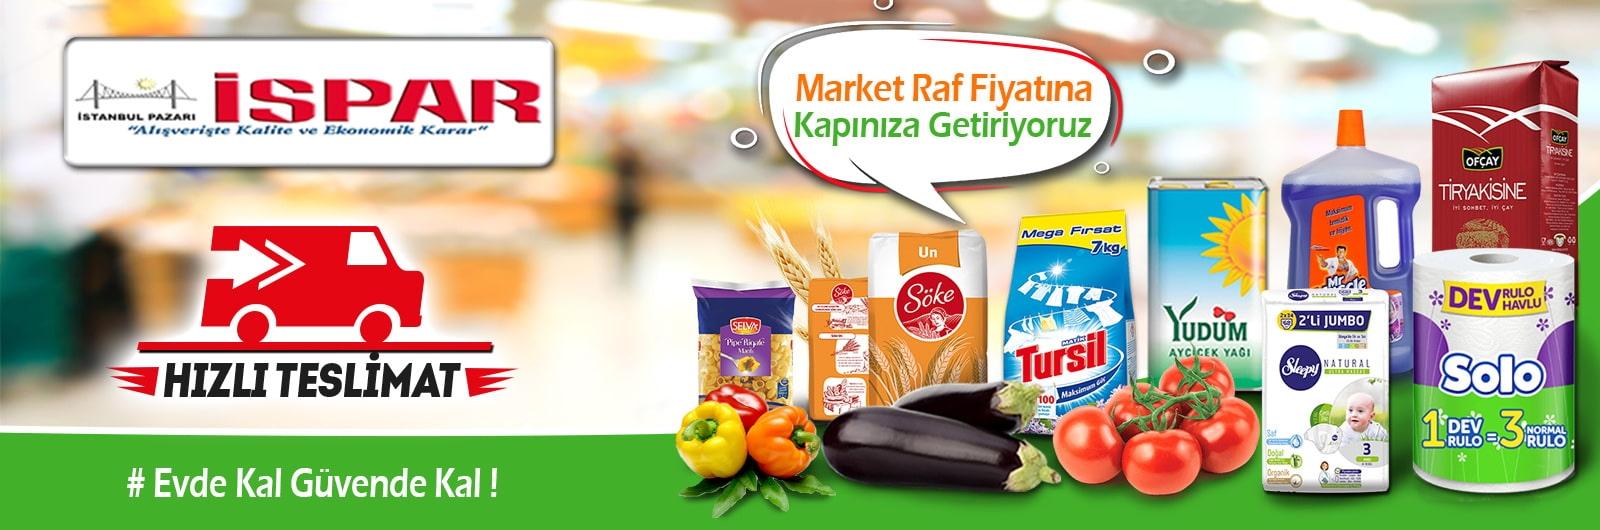 Kartal İspar Sanal Market